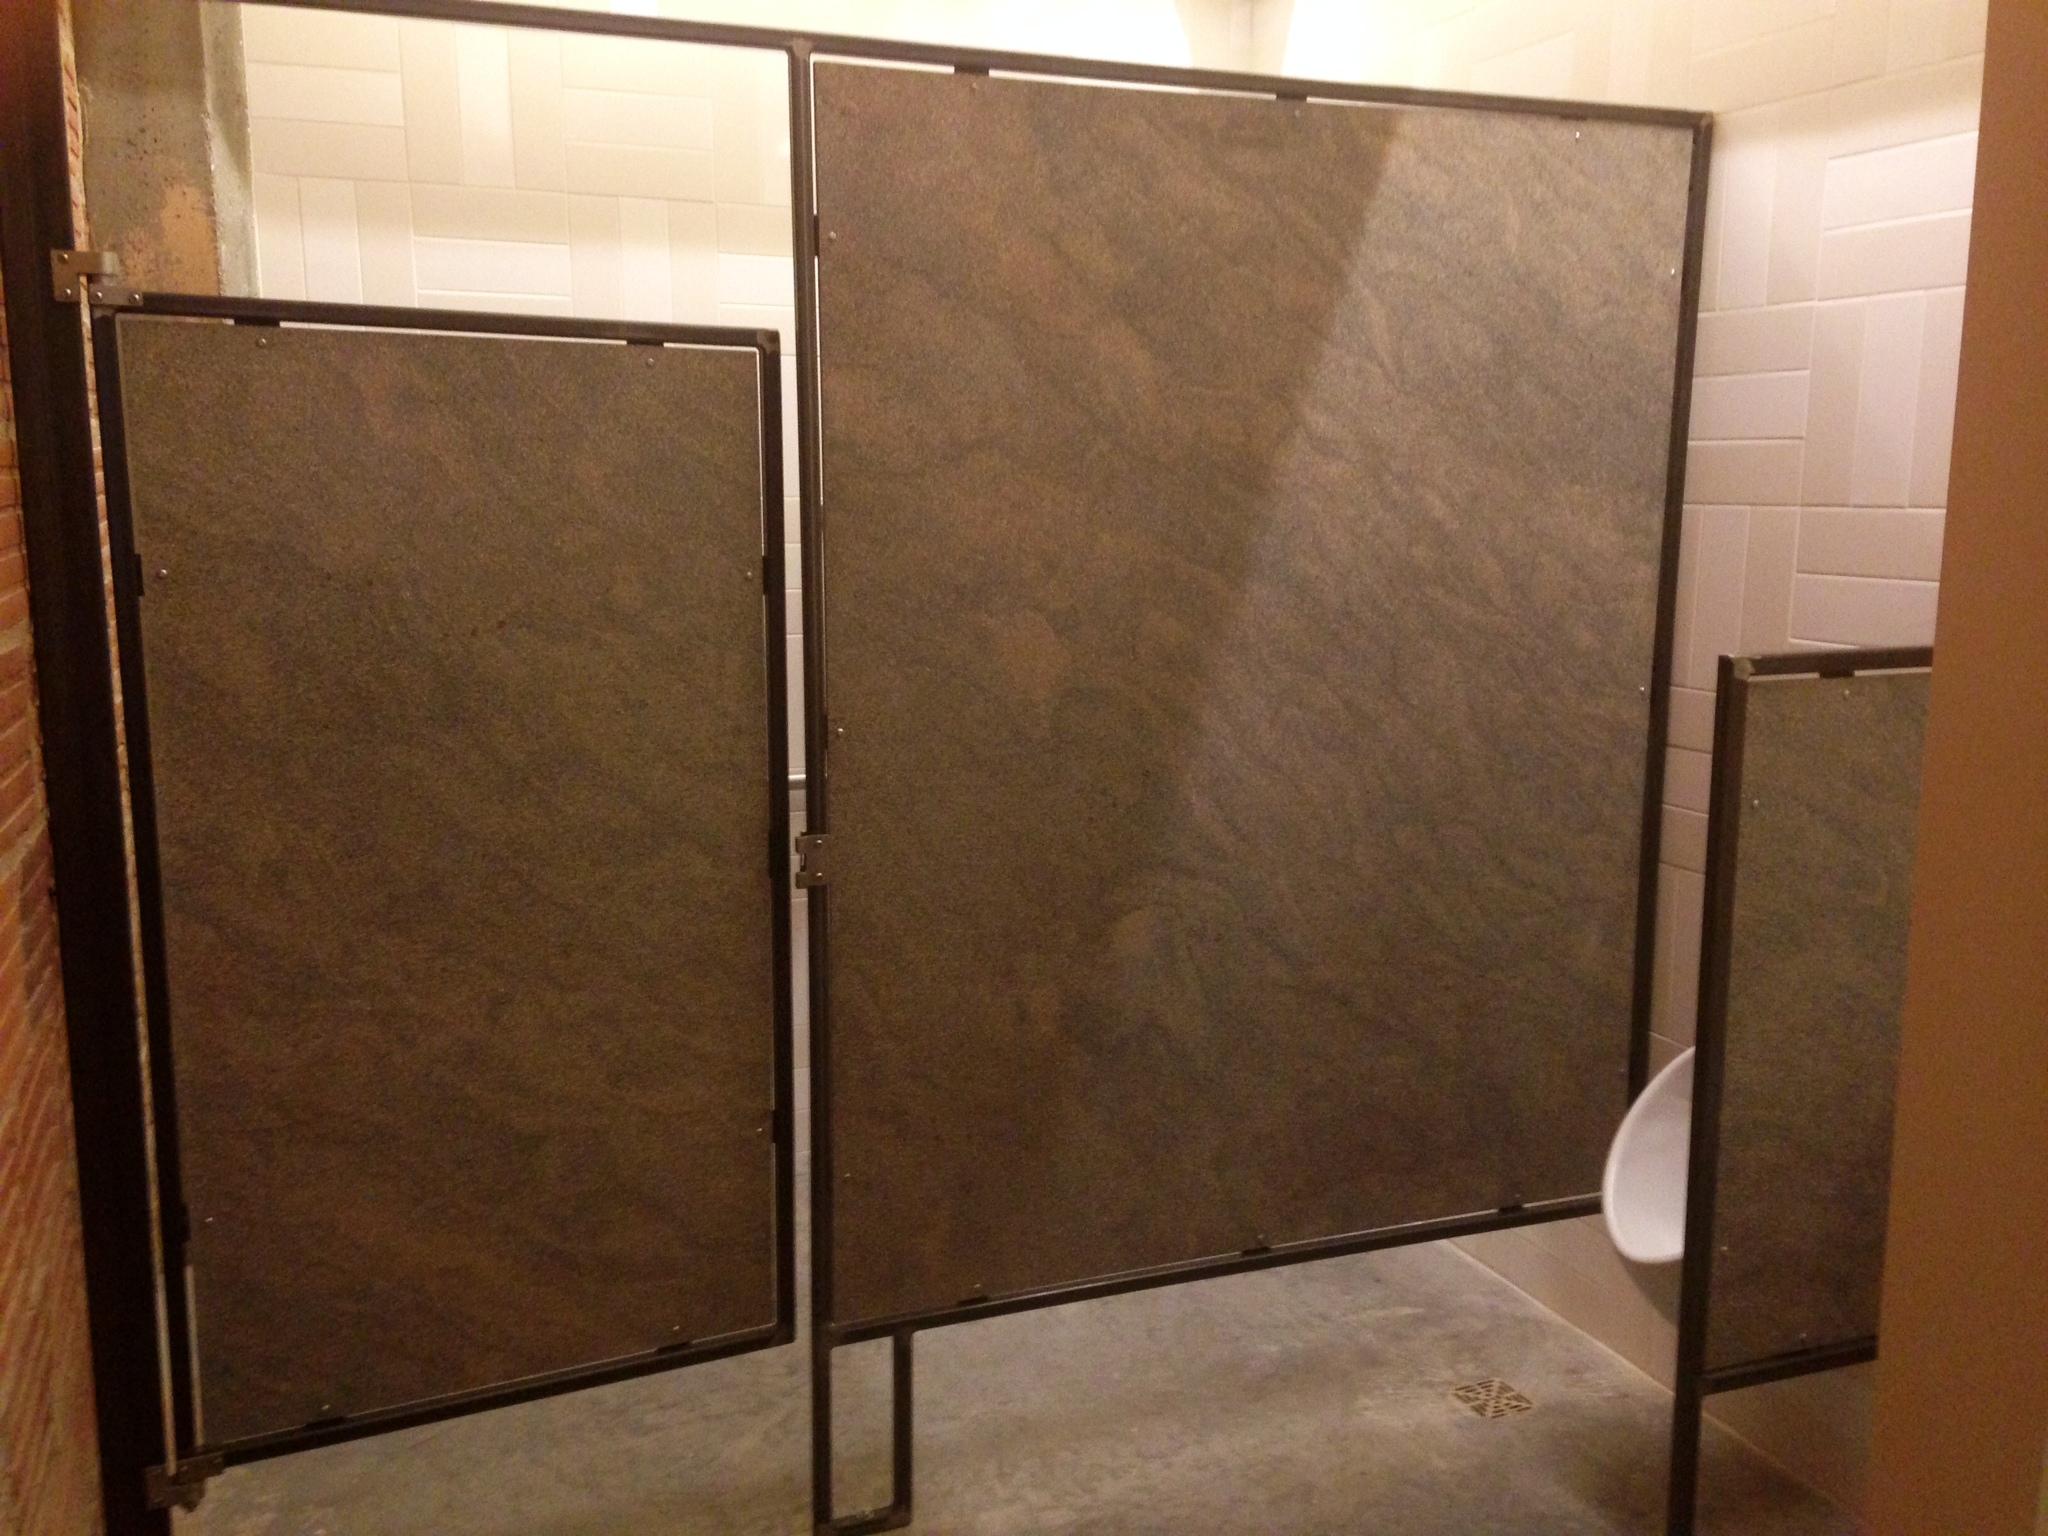 Pezzetinno panels-2.JPG